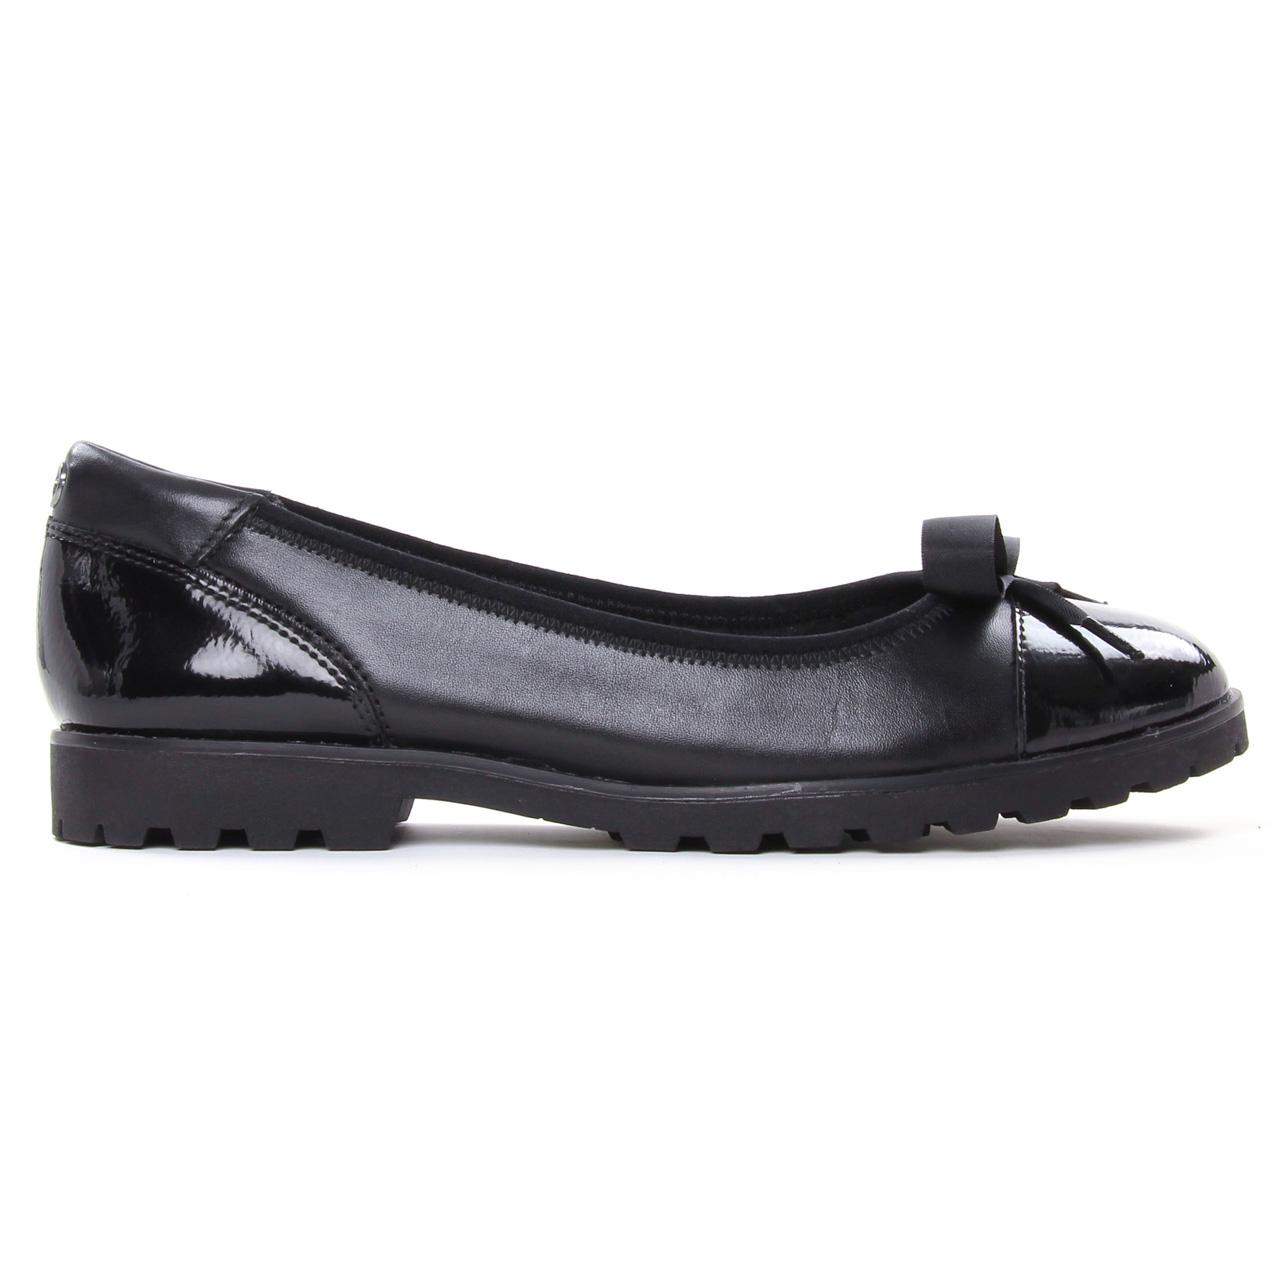 Tamaris 22100 Black Comb | ballerine confort noir automne